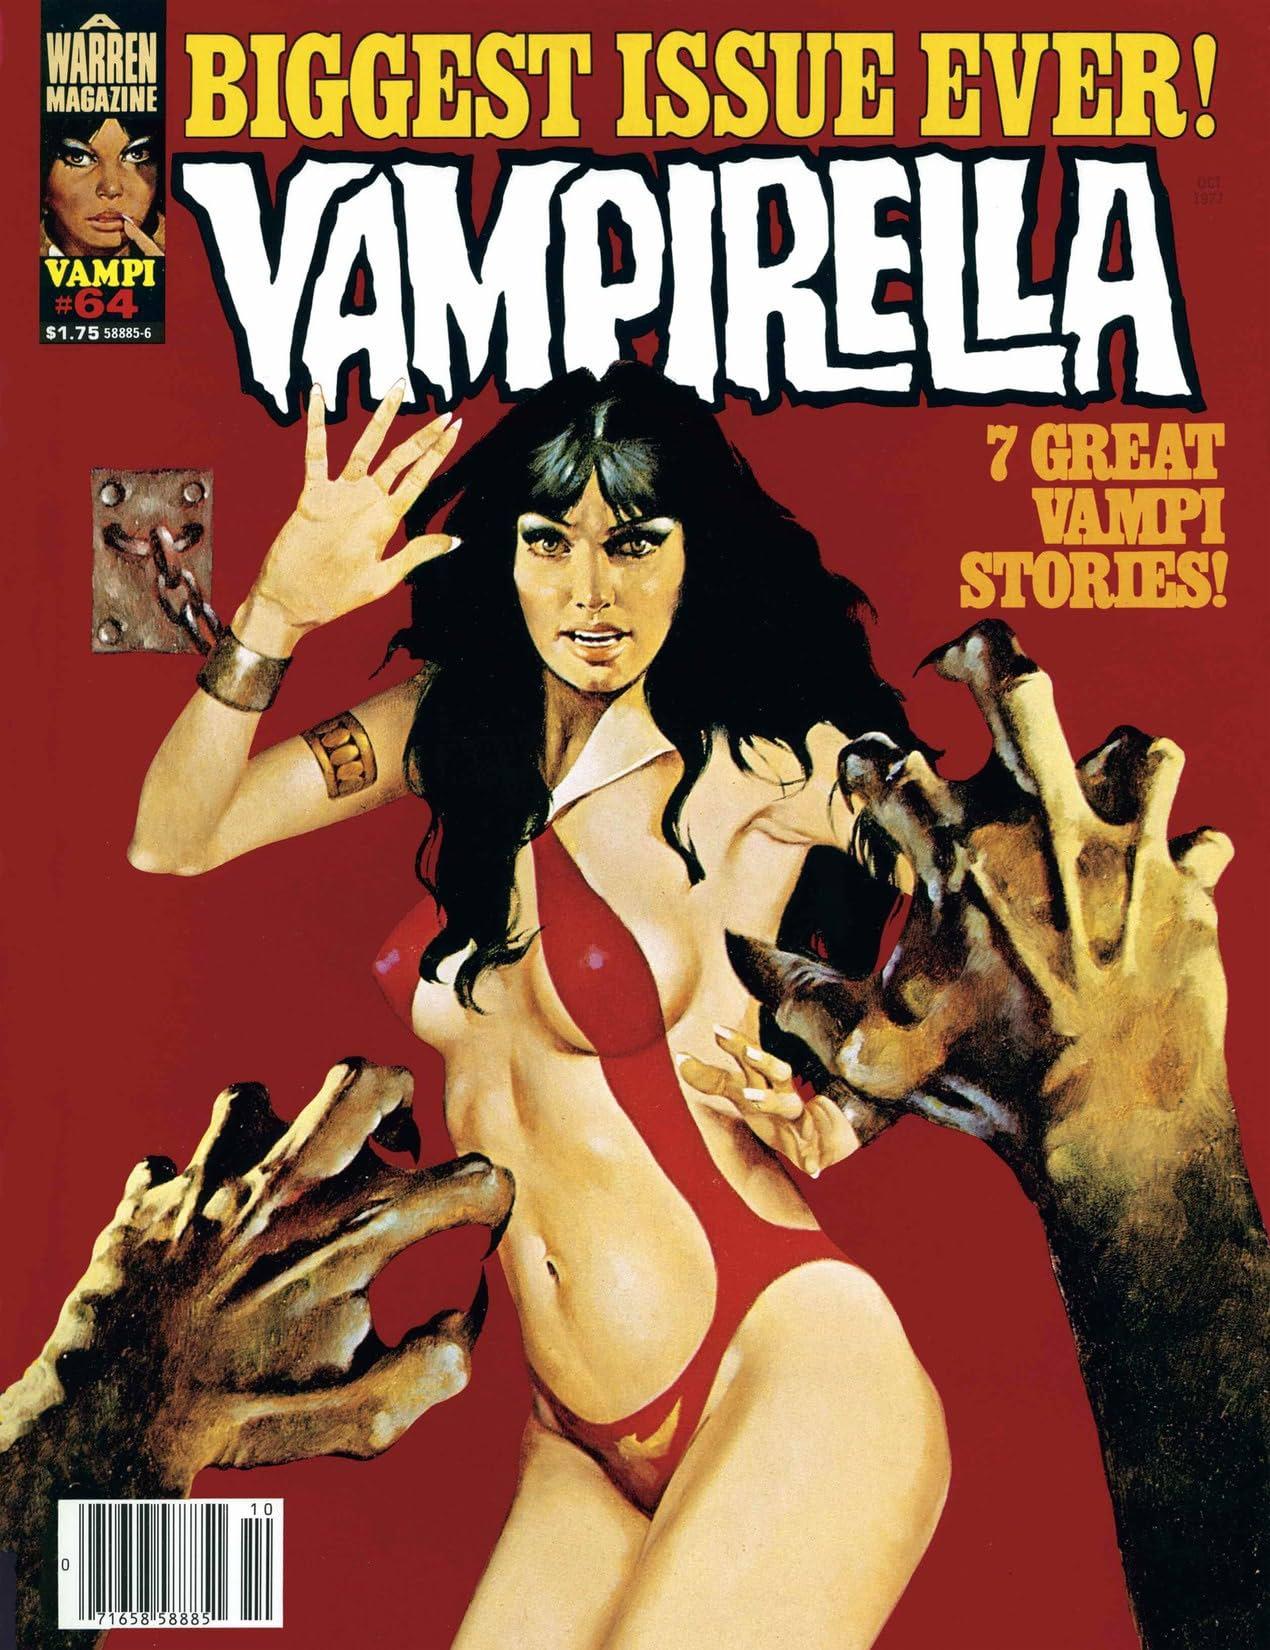 Vampirella (Magazine 1969-1983) #64